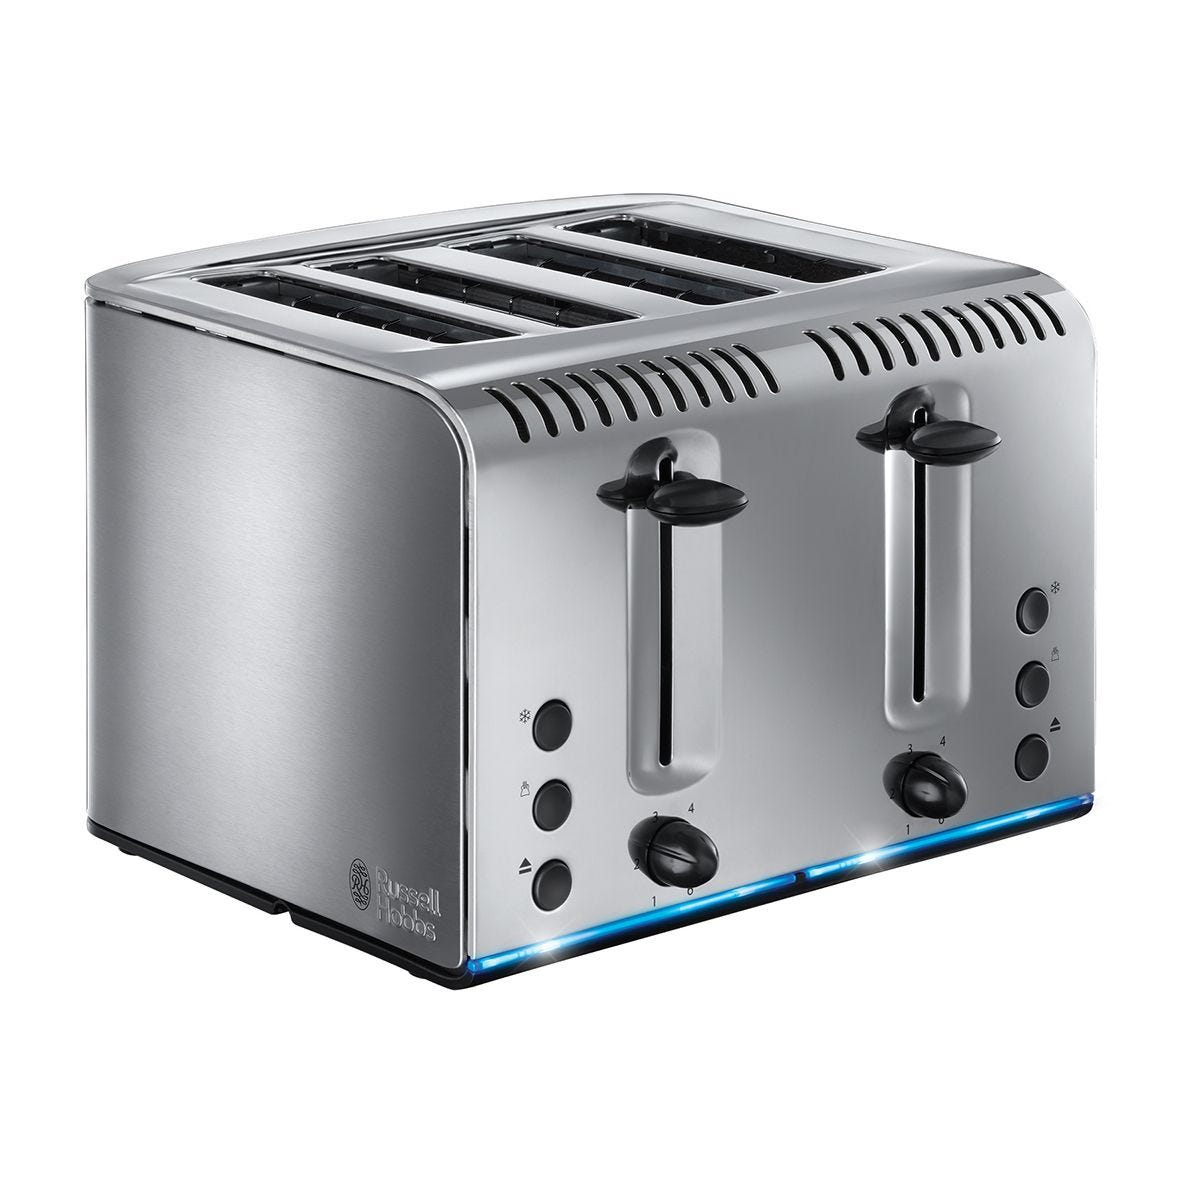 Russell Hobbs 20750 Buckingham 4-Slice Toaster - Stainless Steel